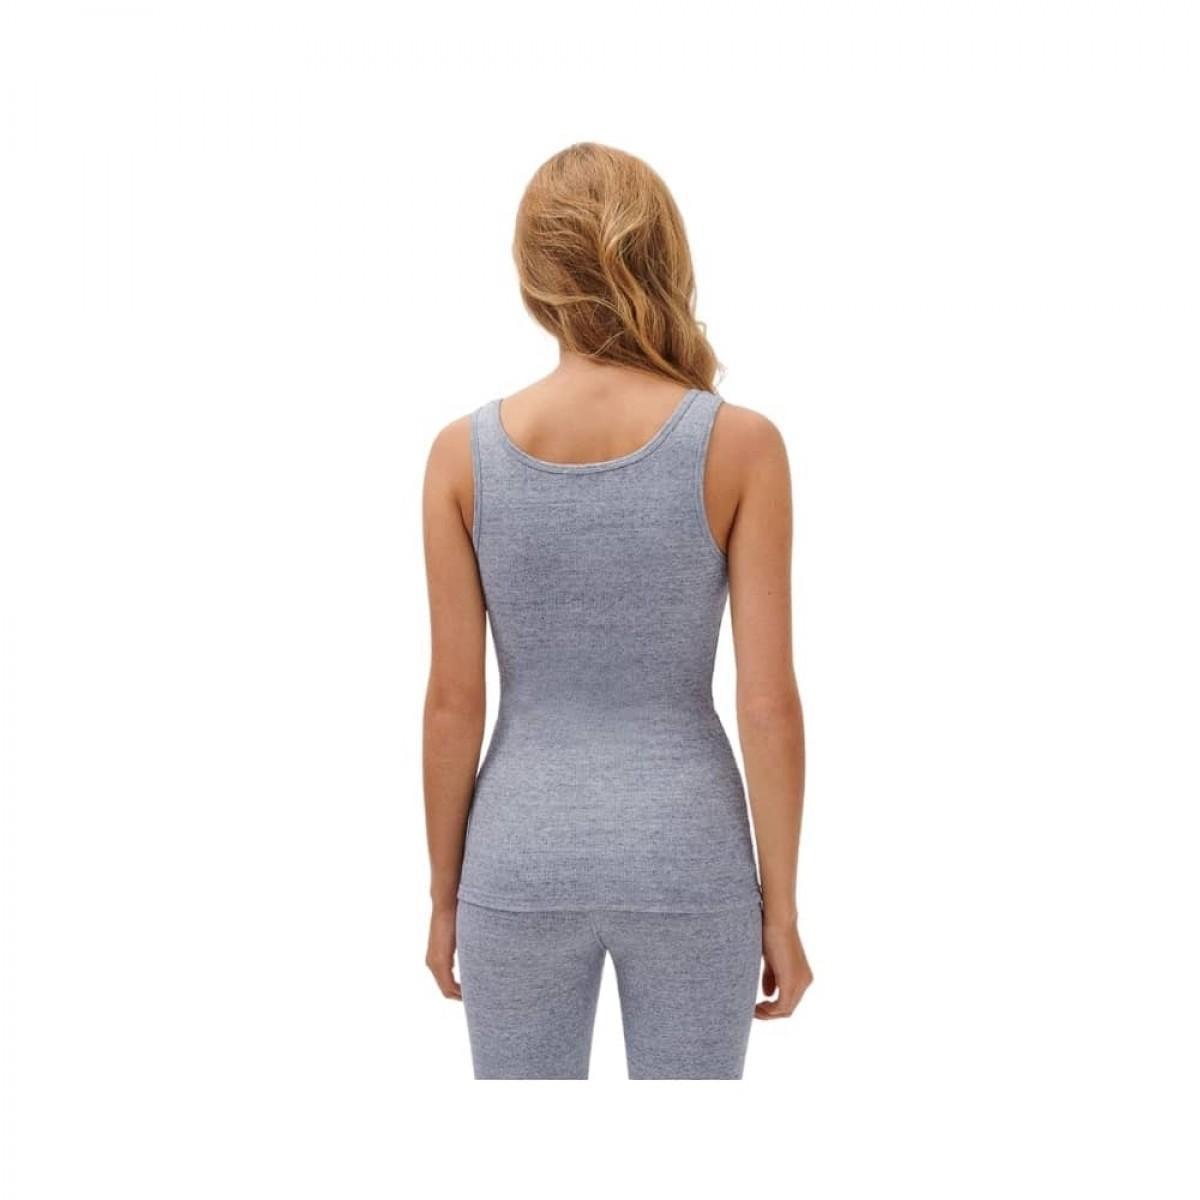 nooby top - heather grey - model fra ryggen